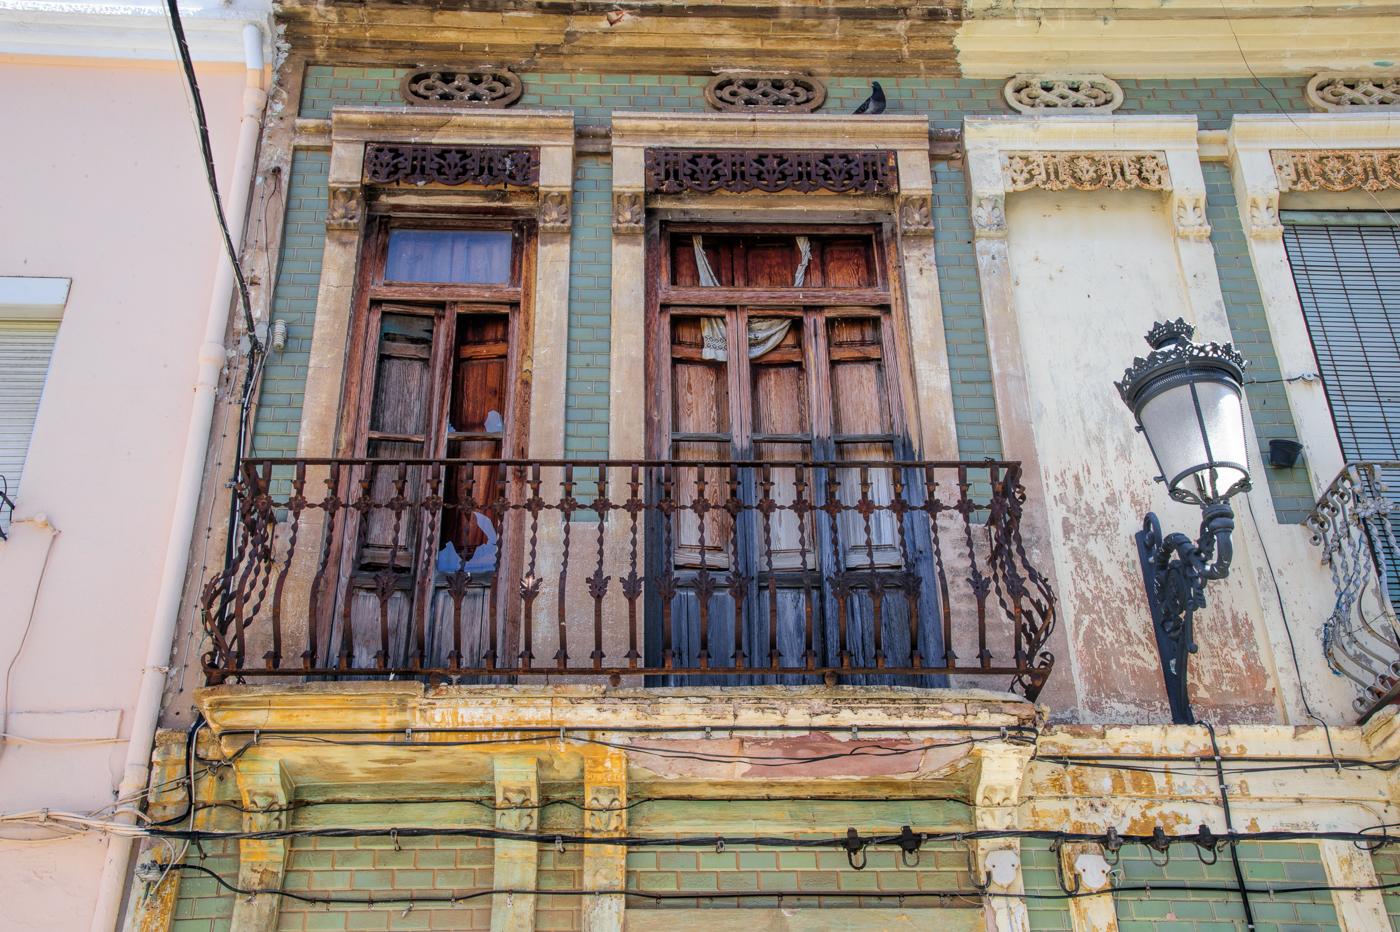 Decaying house, El Cabanyal